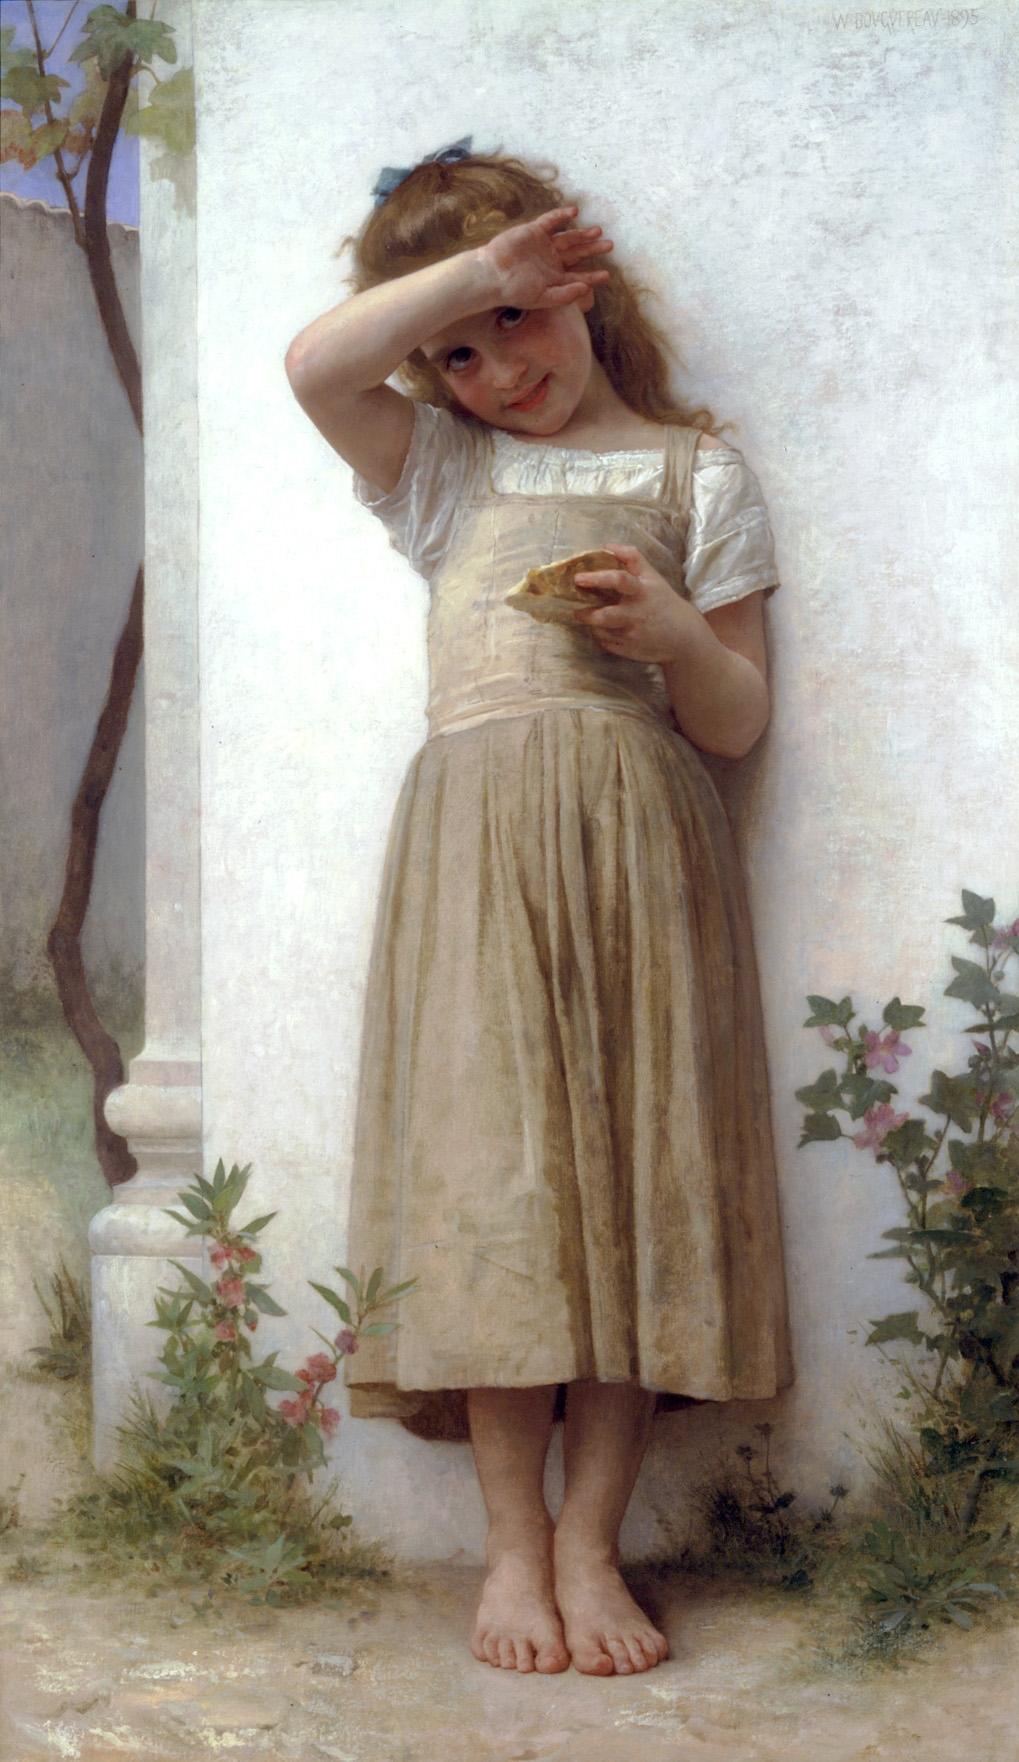 William bouguereau un pintor estupendo arte y pinturas for 1825 2